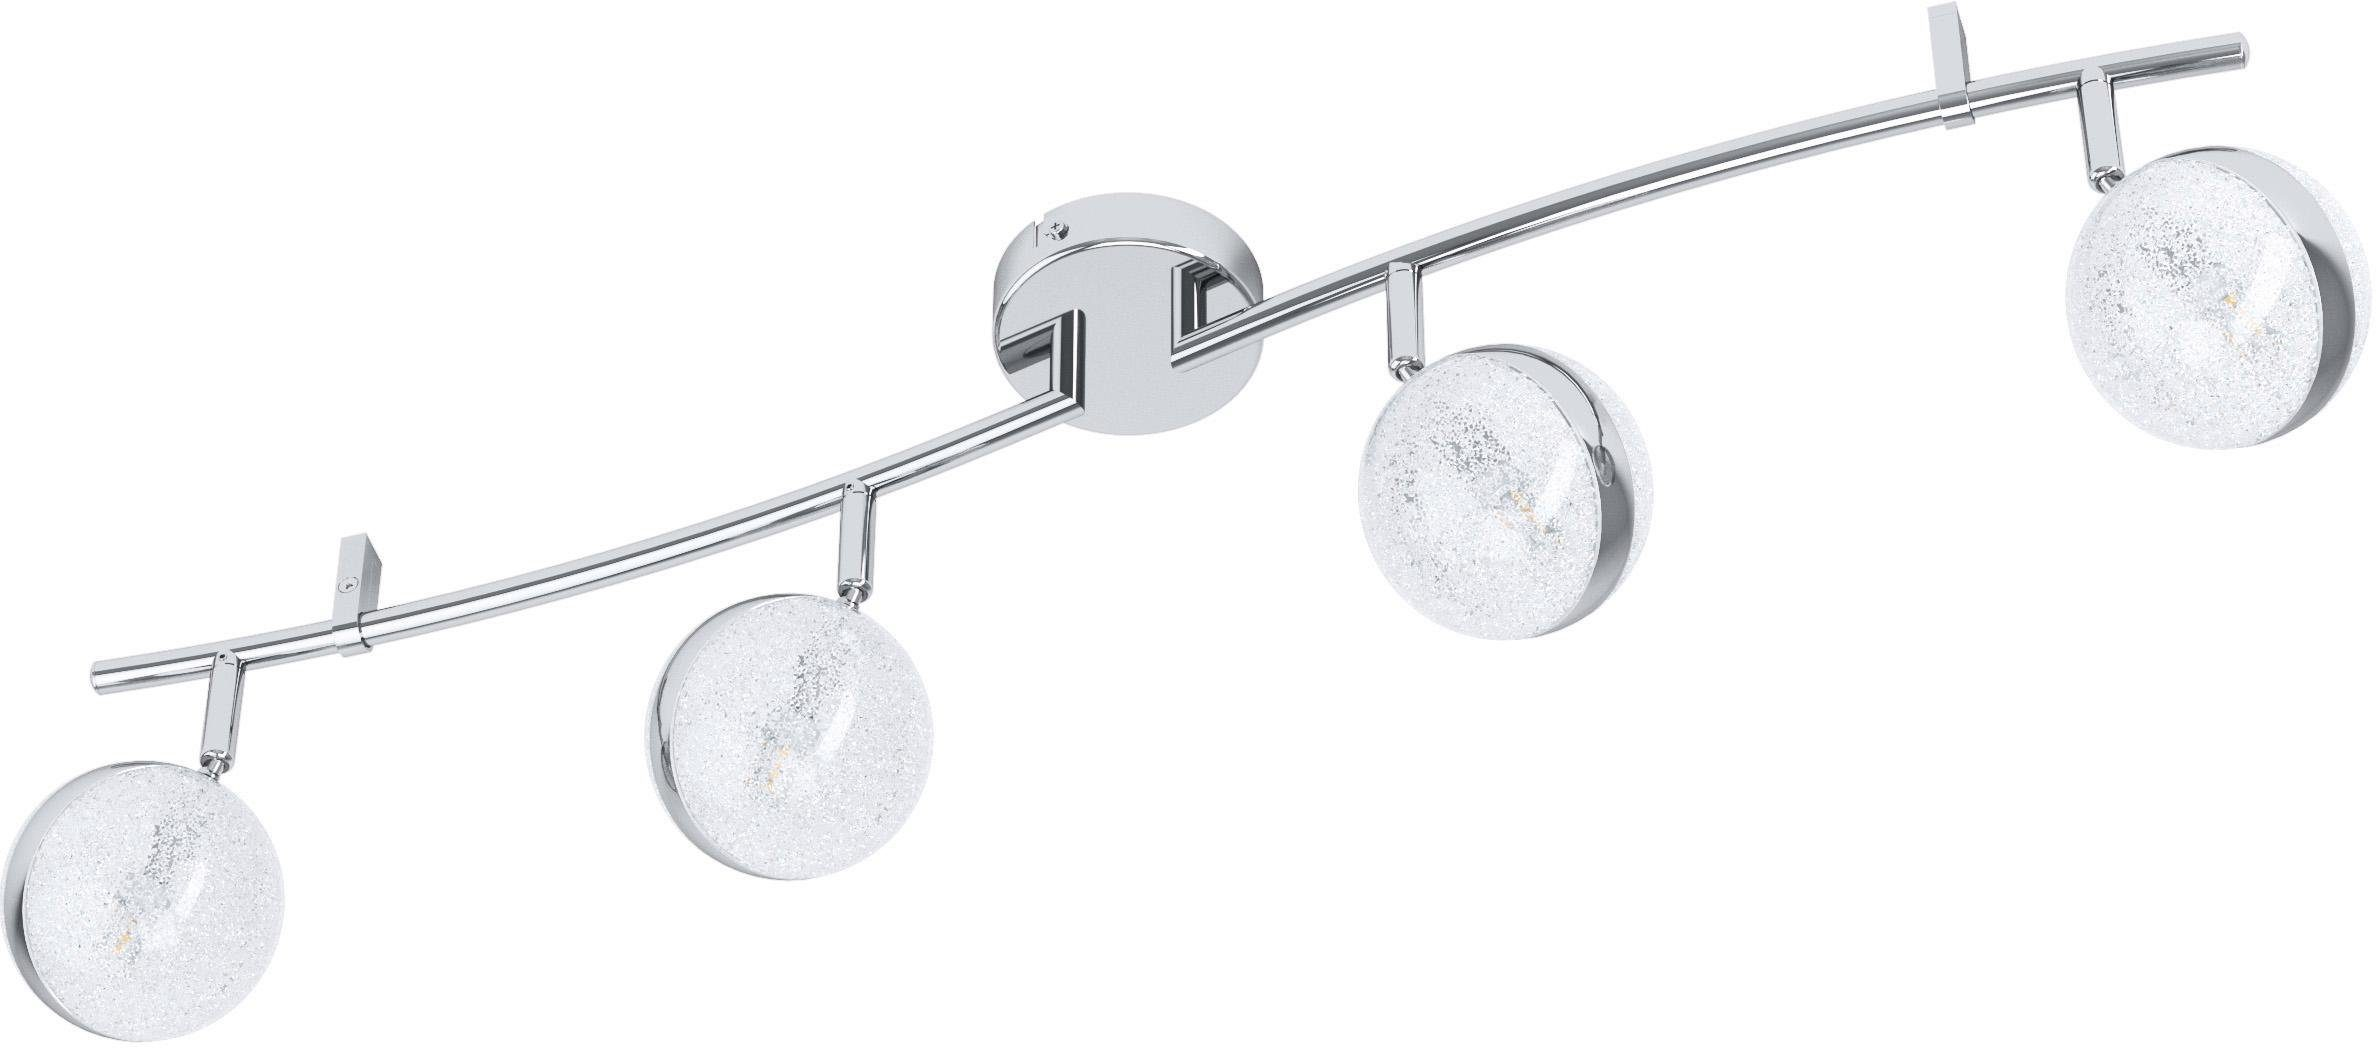 EGLO LED Deckenspots SALTO 3, LED-Board-G9, Warmweiß, LED Deckenleuchte, LED Deckenlampe